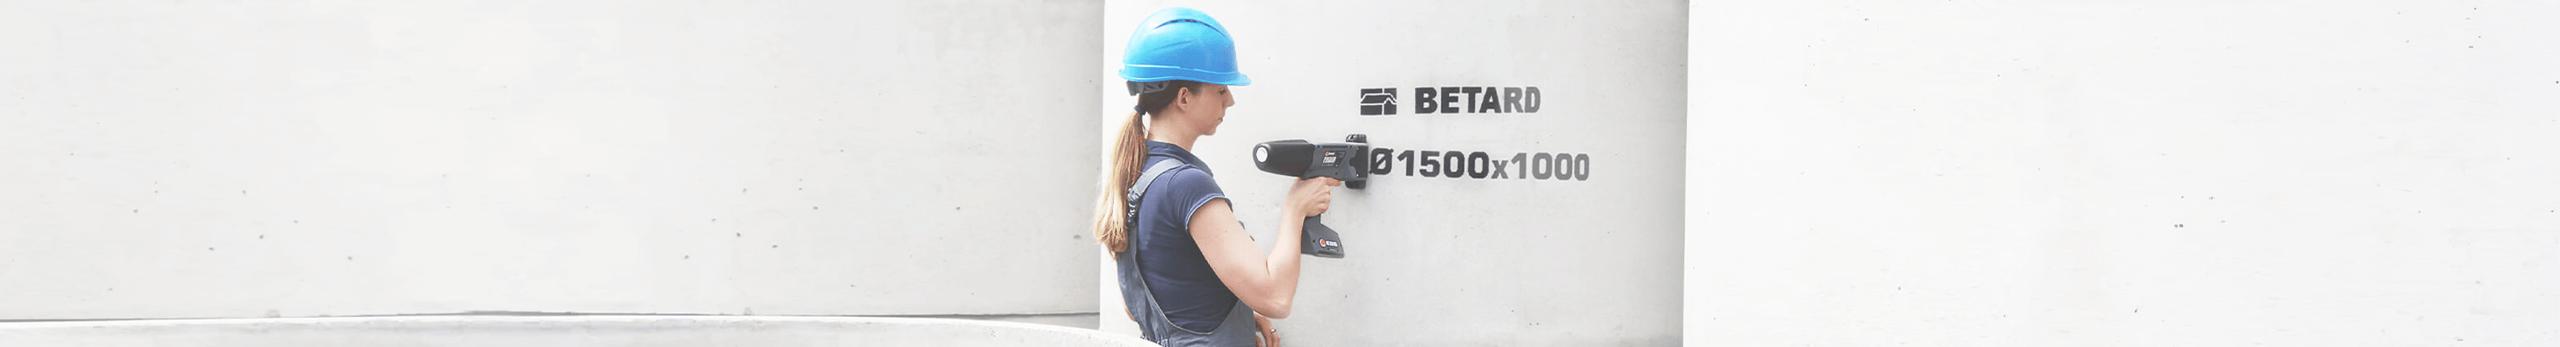 4-rolkowy stabilizator EBS-250 - P511312 - stabilizator probn